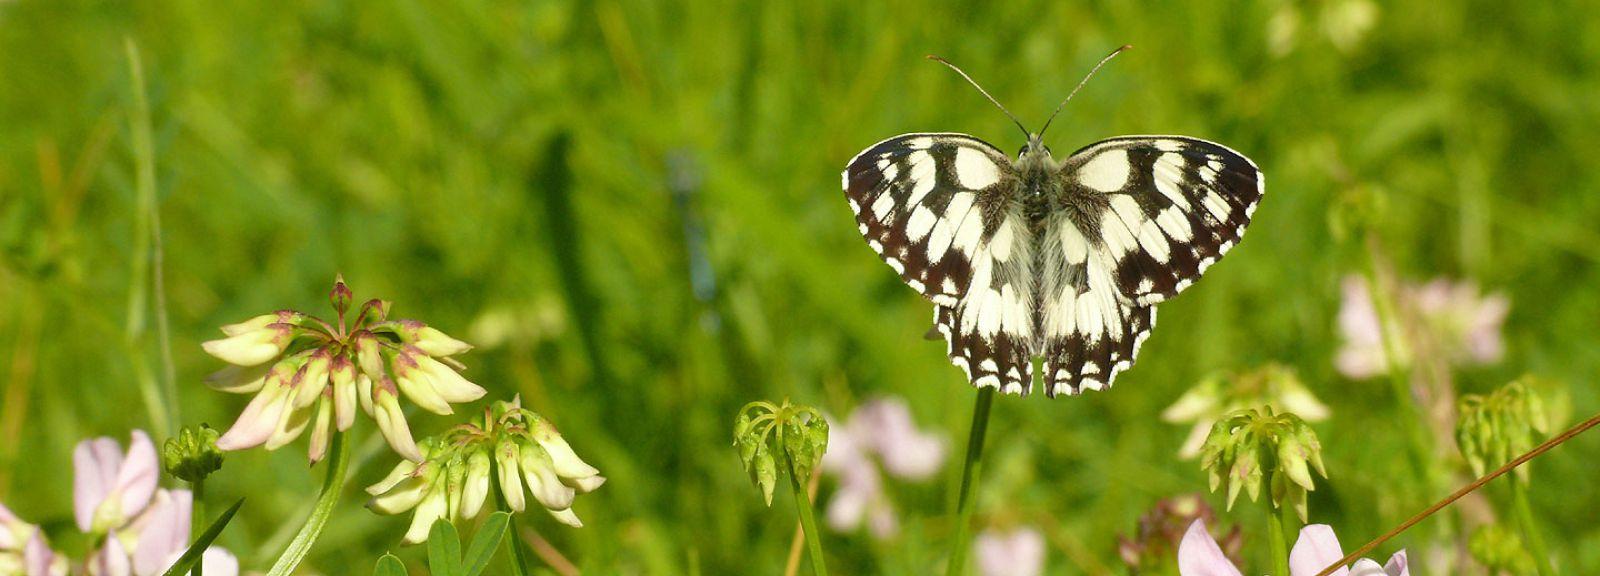 Papillon Demi-Deuil, Melanargia galathea (Linnaeus, 1758) © MNHN / SPN - Renaud Puissauve